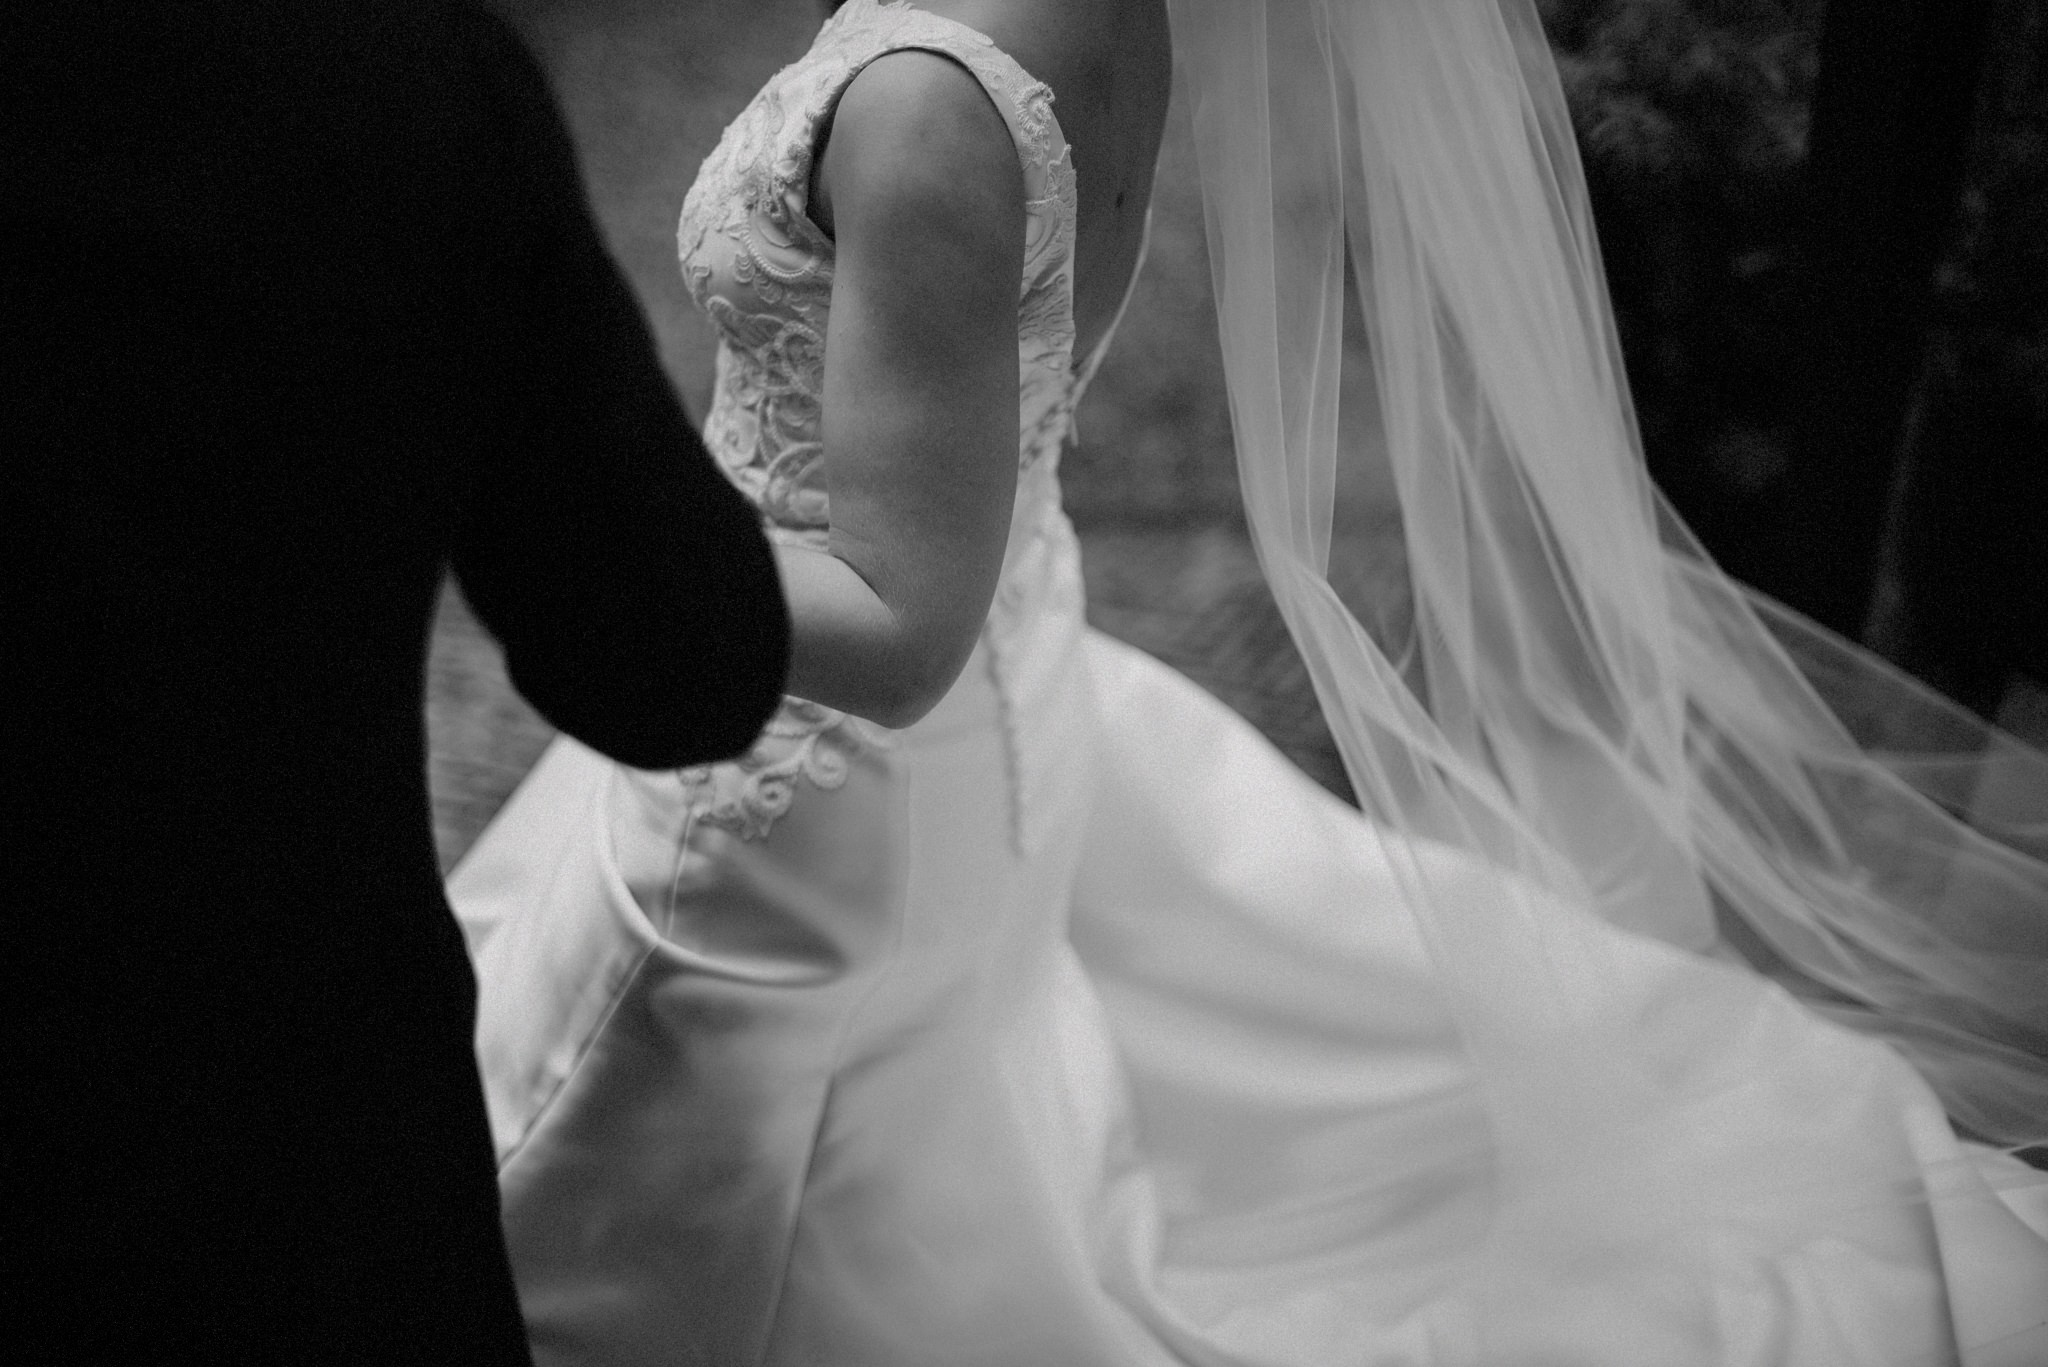 Bruidsfotografie Buitenplaats Sparrendaal - Naomi van der Kraan 0049.jpg